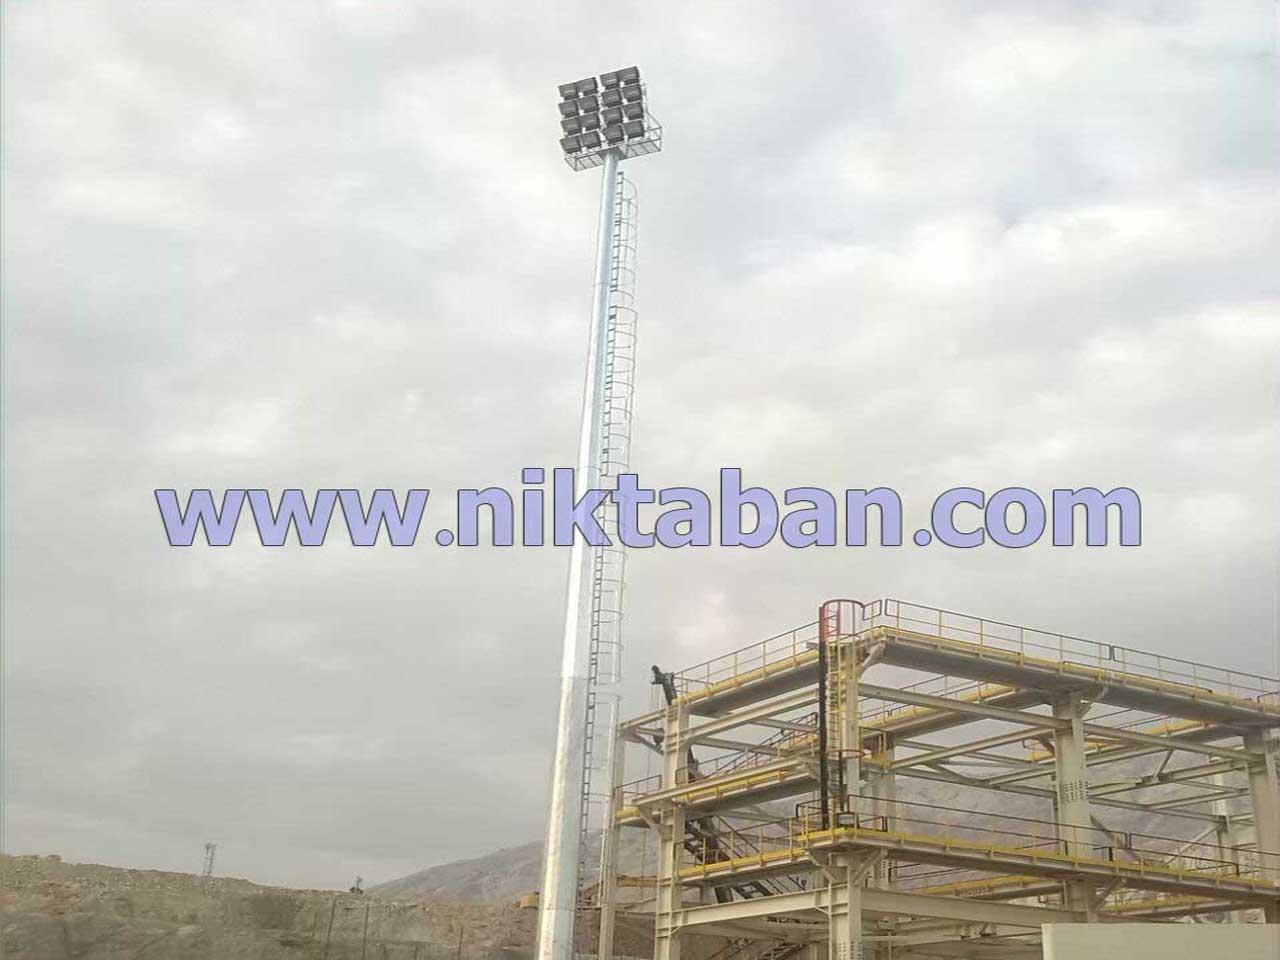 برج استادیومی عسلویه